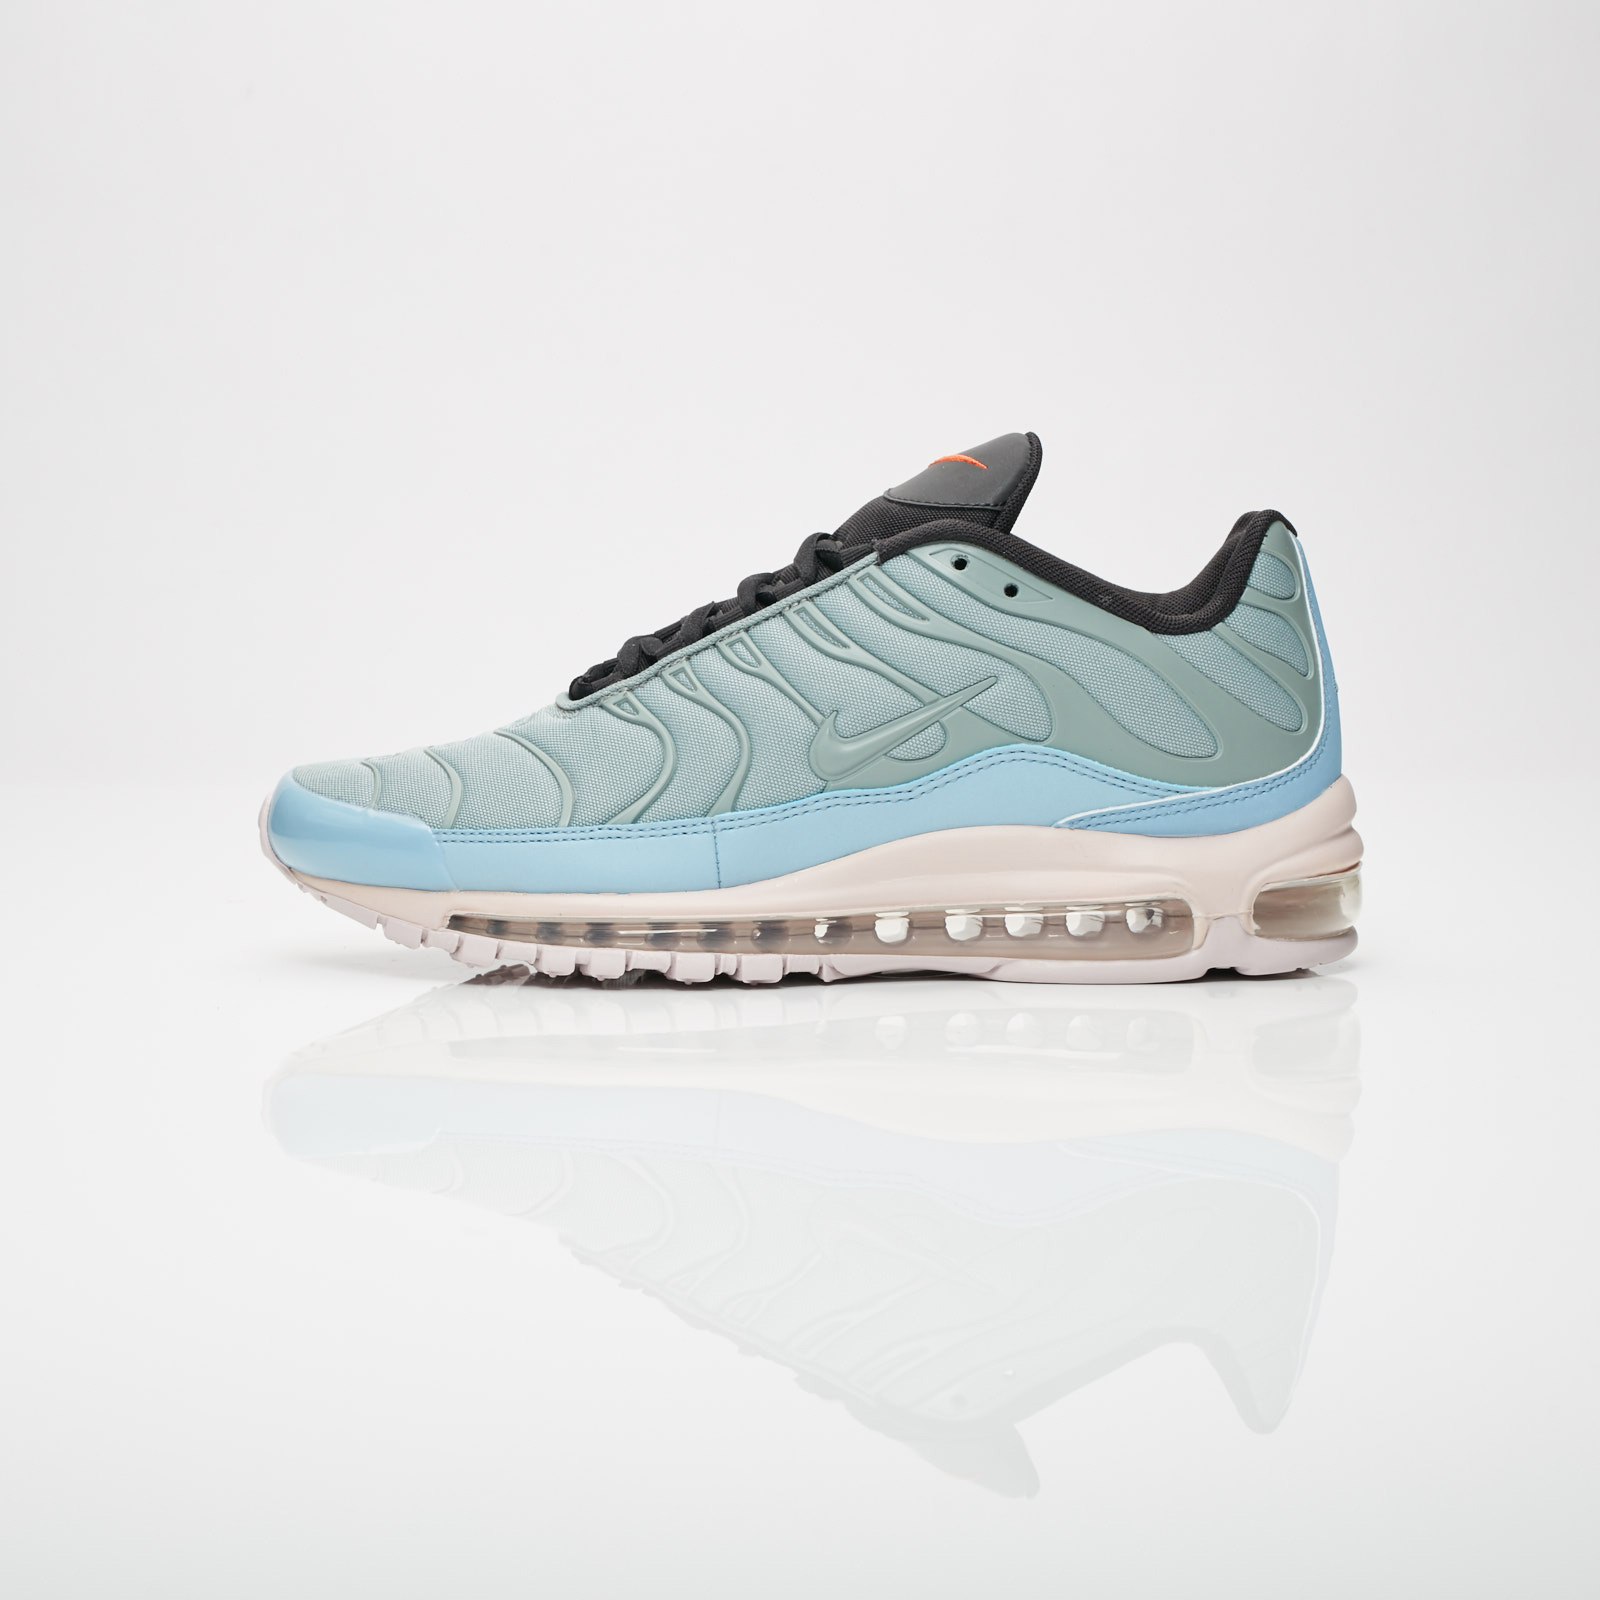 online store 443ab f683a Nike Air Max 97 / Plus - Ah8144-300 - Sneakersnstuff I Sneakers &  Streetwear online seit 1999